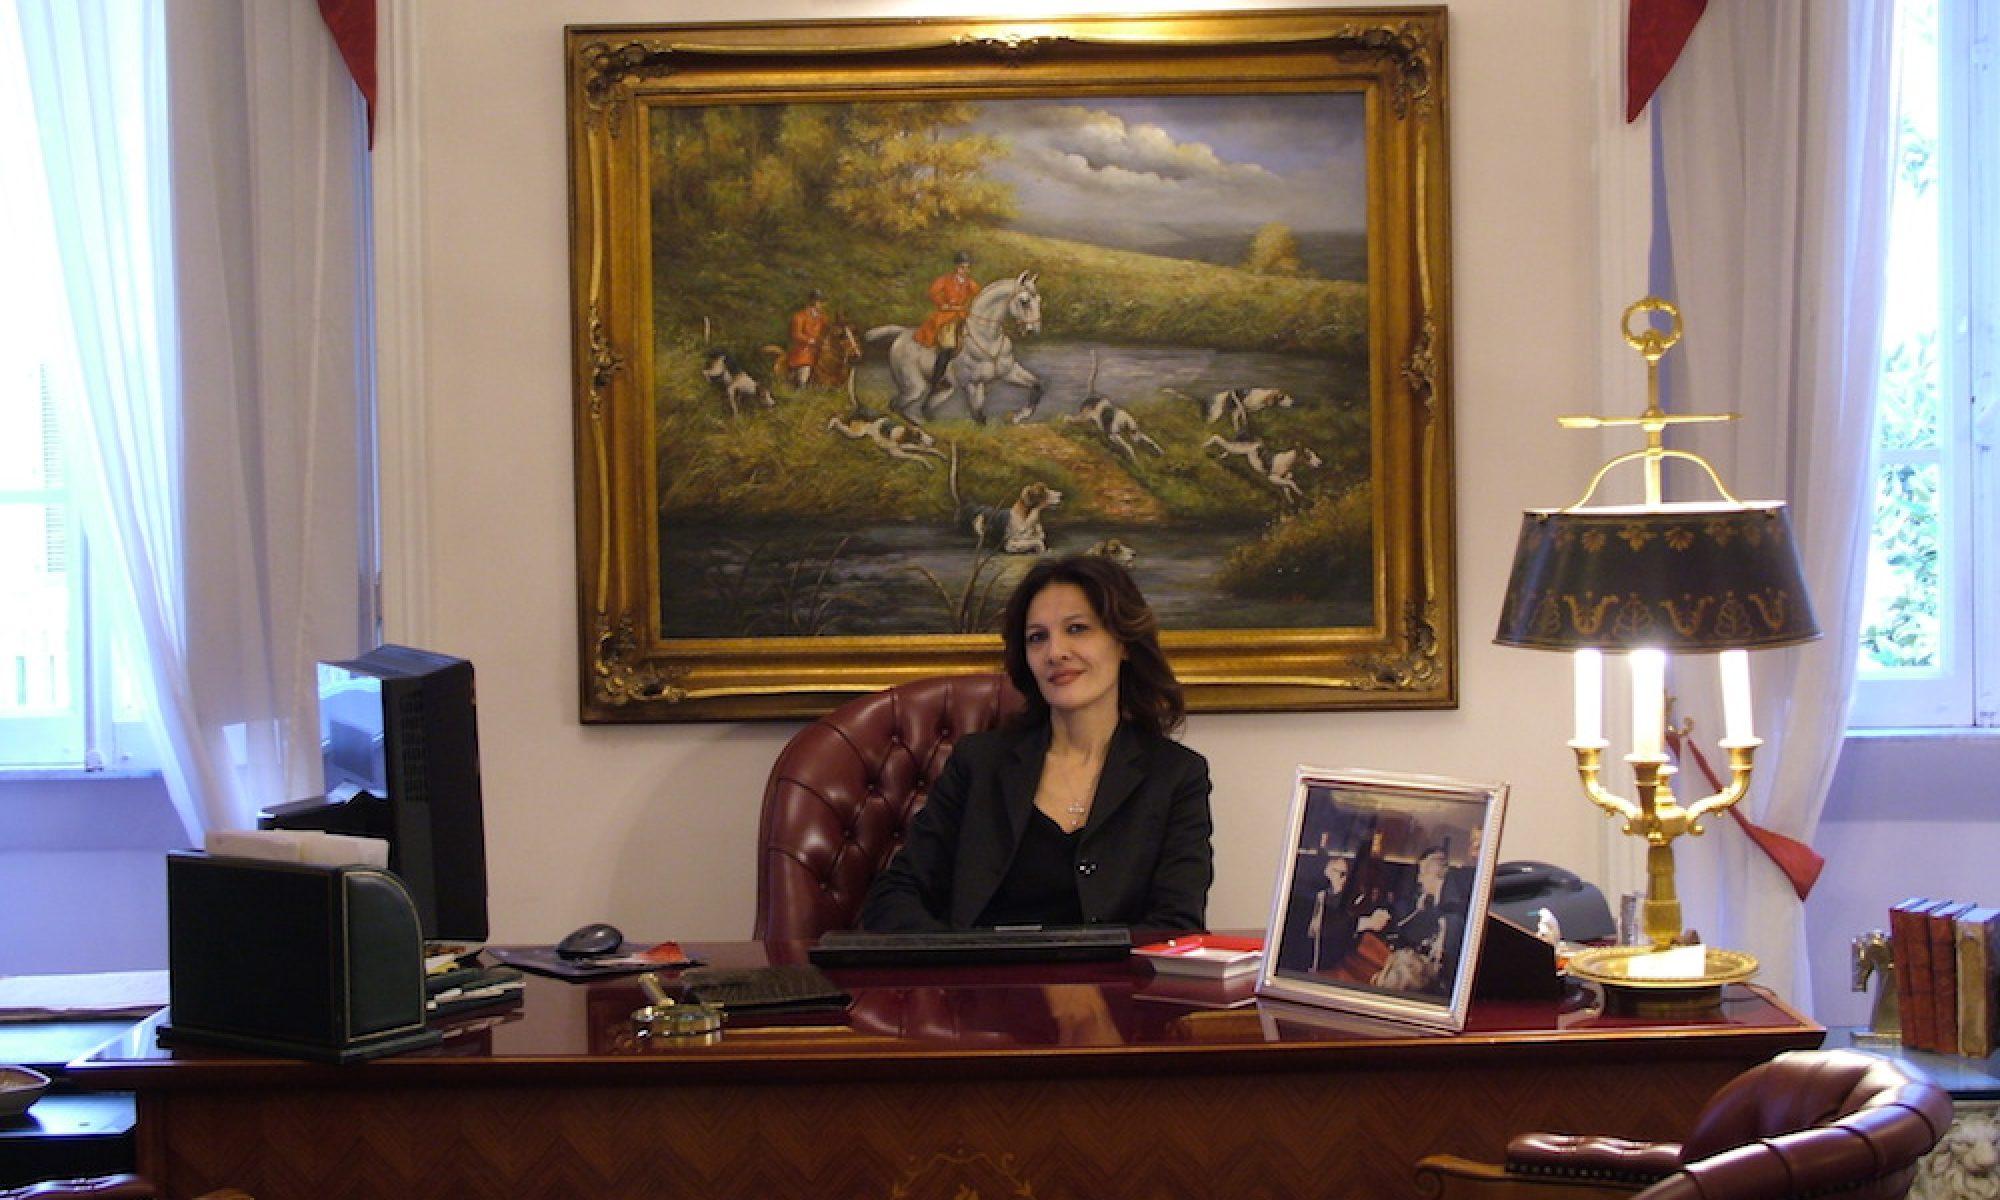 Avvocato Angelica Parente